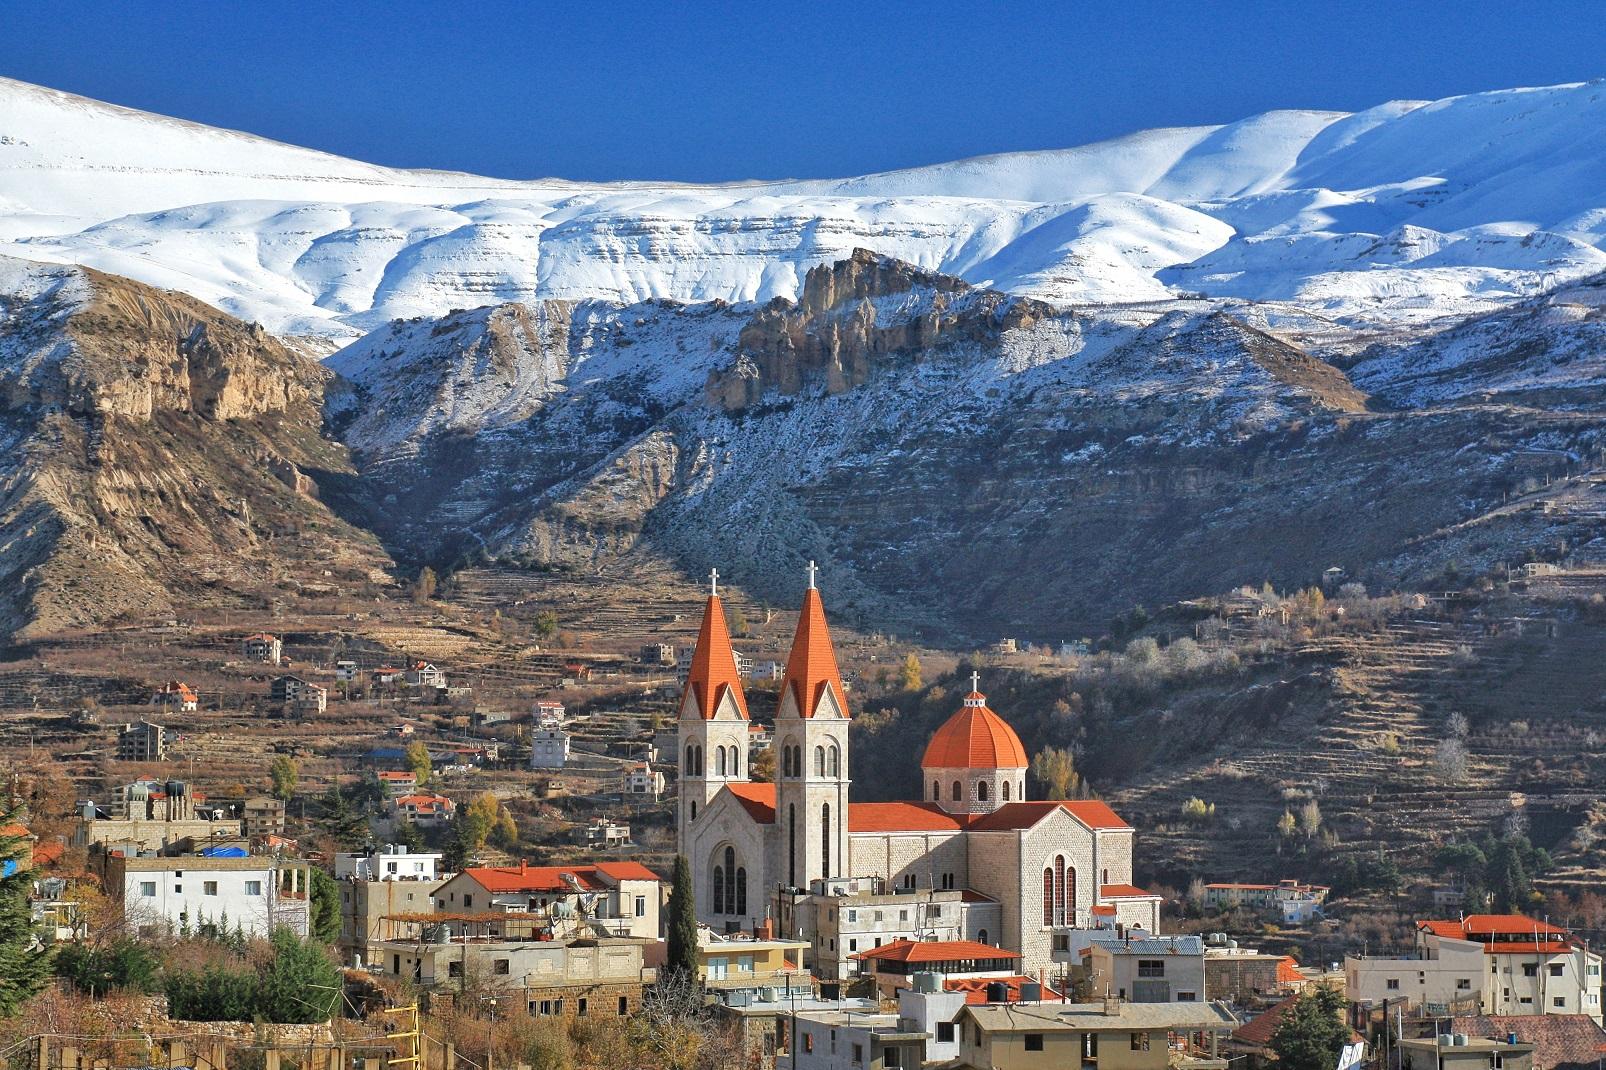 Snow covered mountains and Saint Saba Church in Bsharre, Lebanon